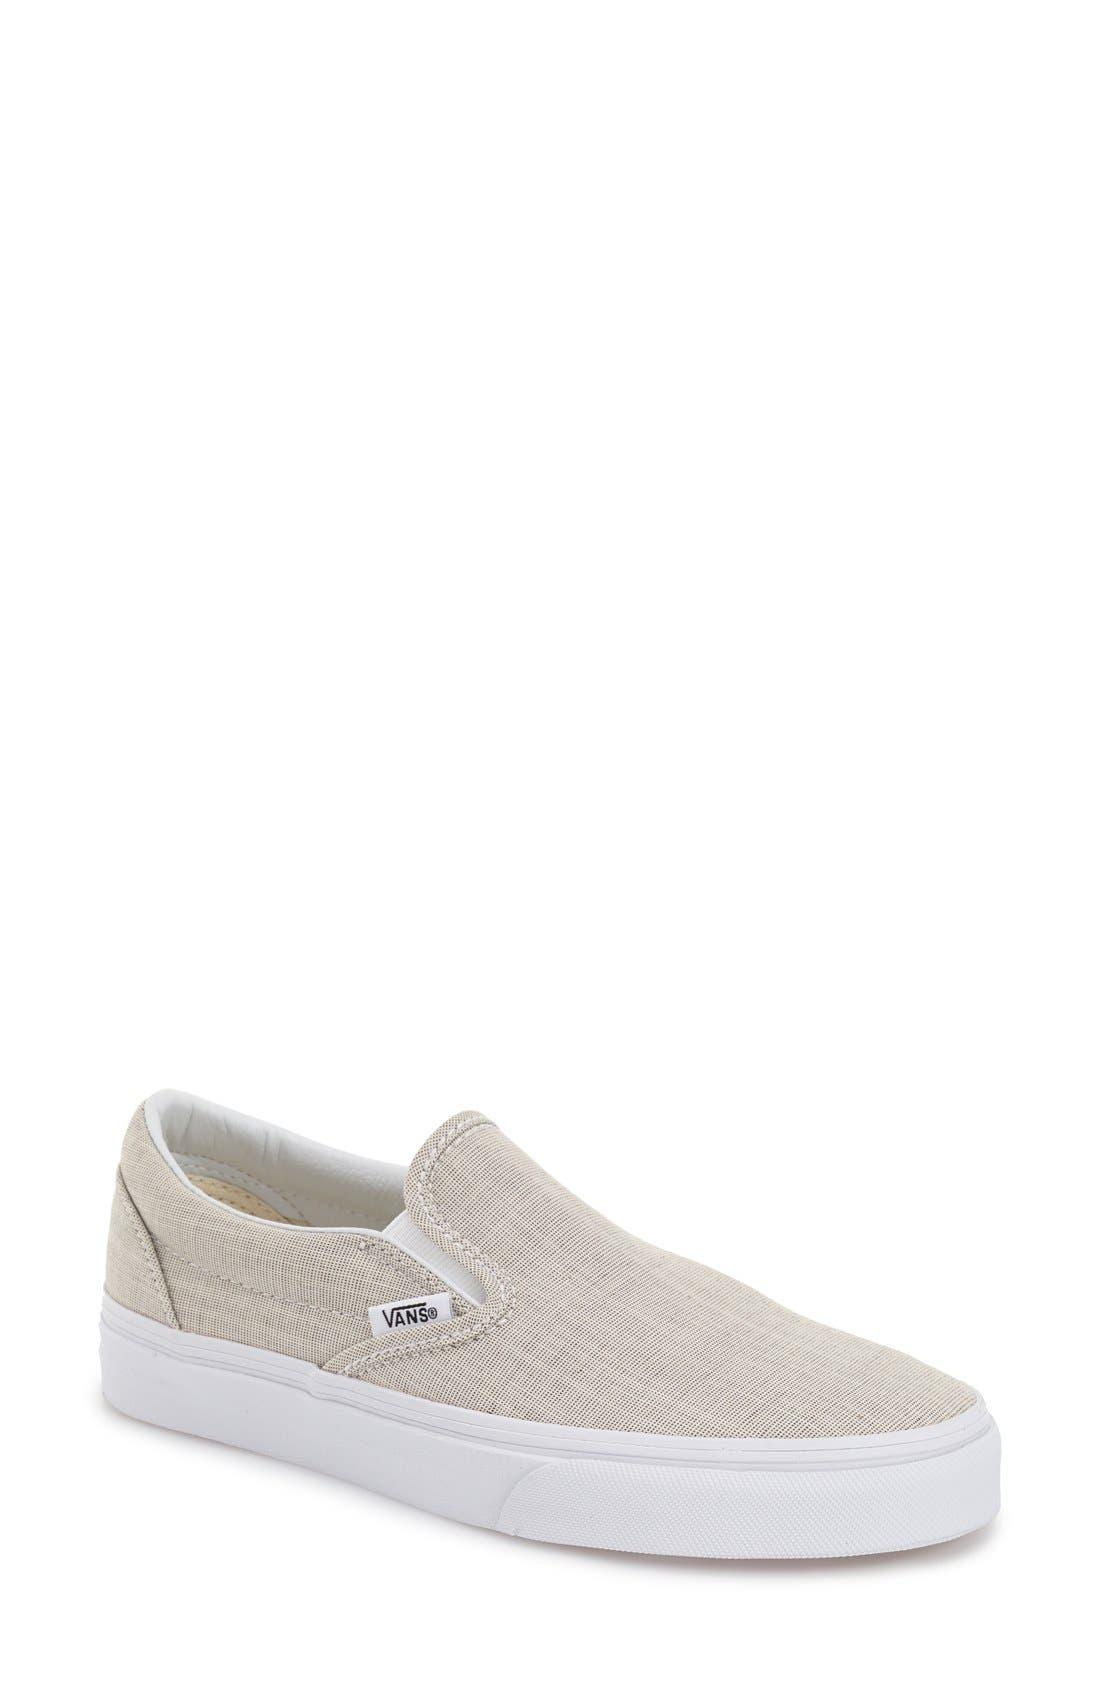 ,                             Classic Slip-On Sneaker,                             Main thumbnail 257, color,                             021